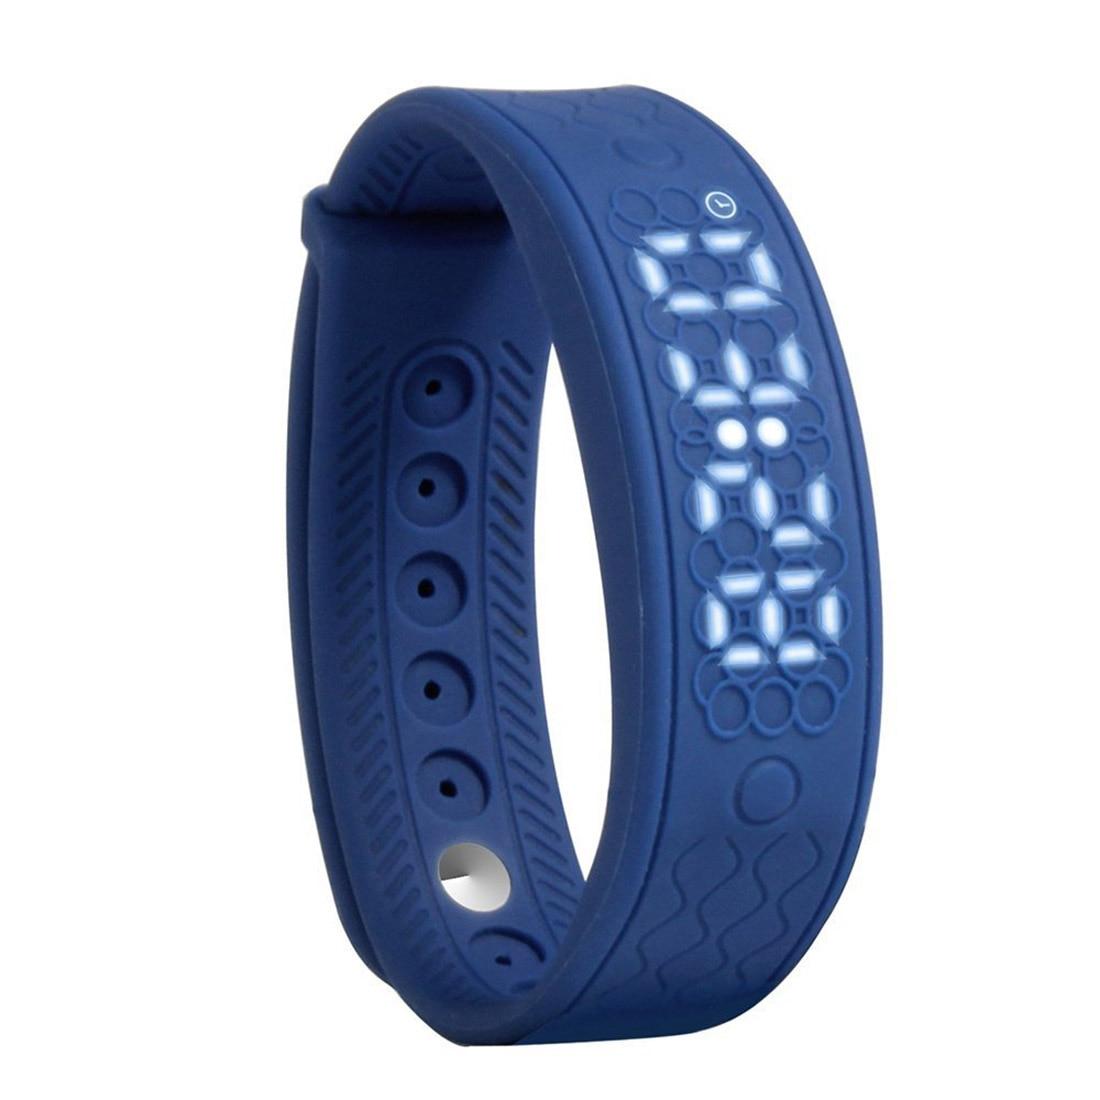 fitness bracelet H5S portable intelligent activity Control Clock Heart Rate Monitor Smart Bracelet distance calculator Blue